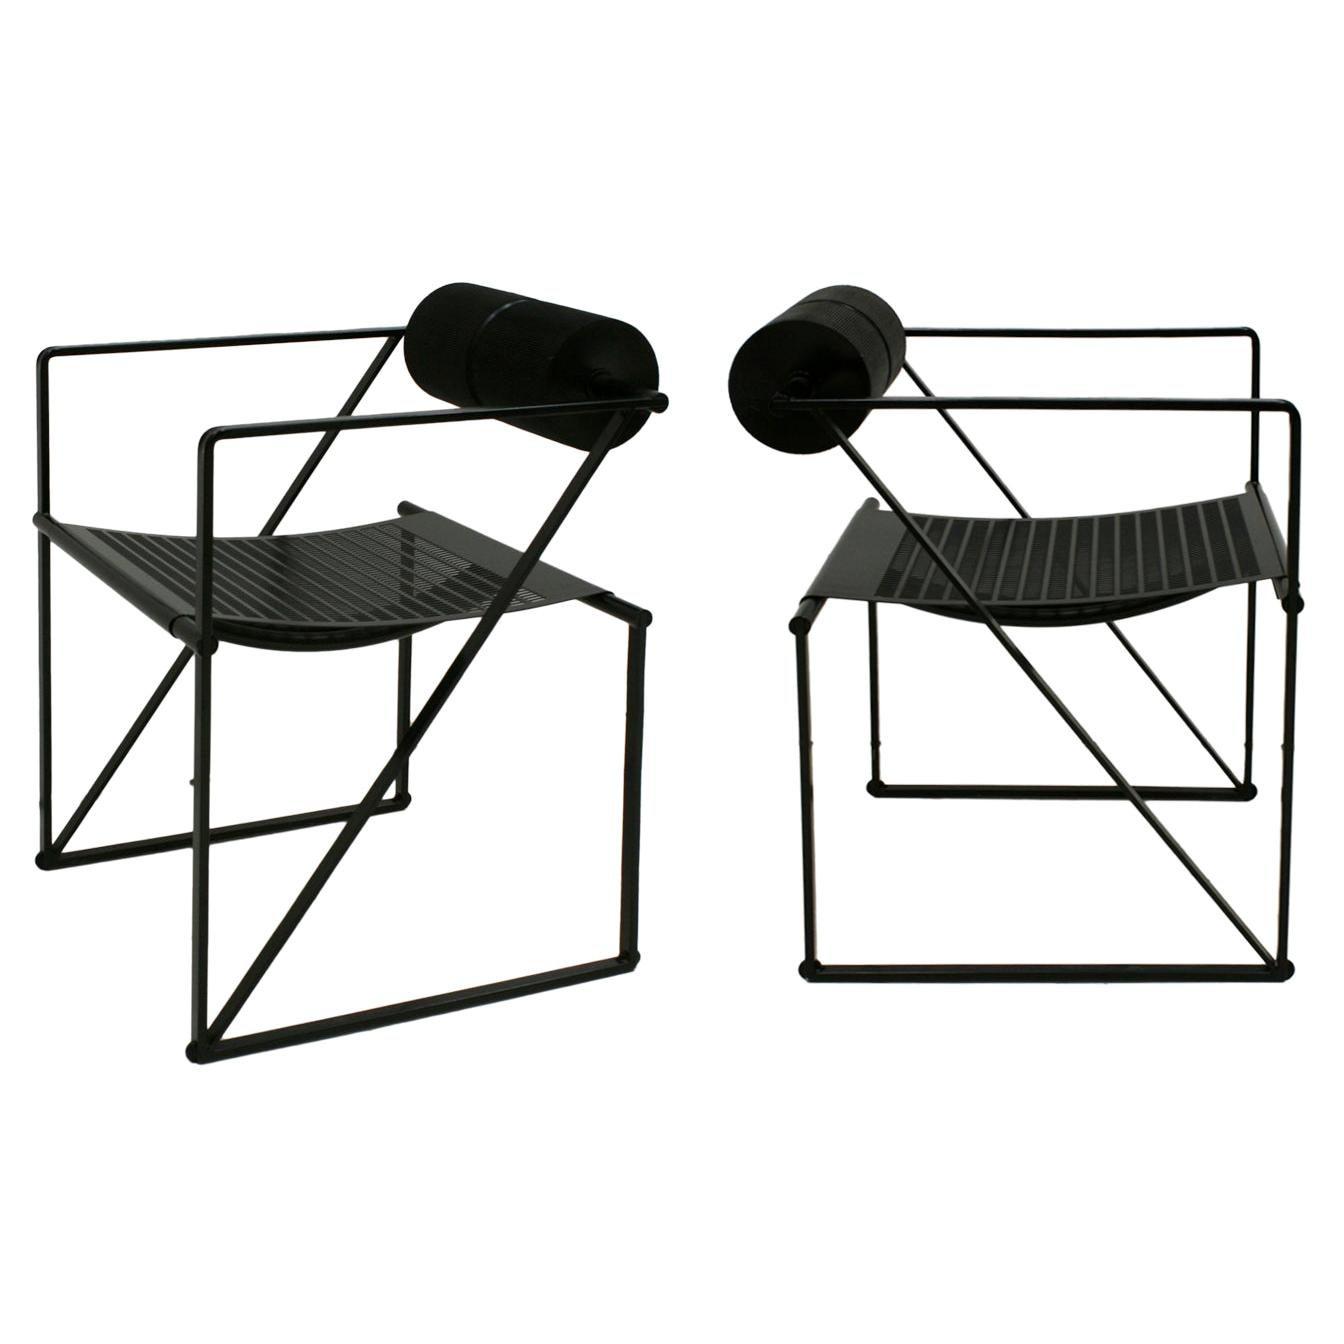 "Mid-Century Modern Pair of Chairs Mod ""Seconda"" Designed by Mario Botta, 1982"